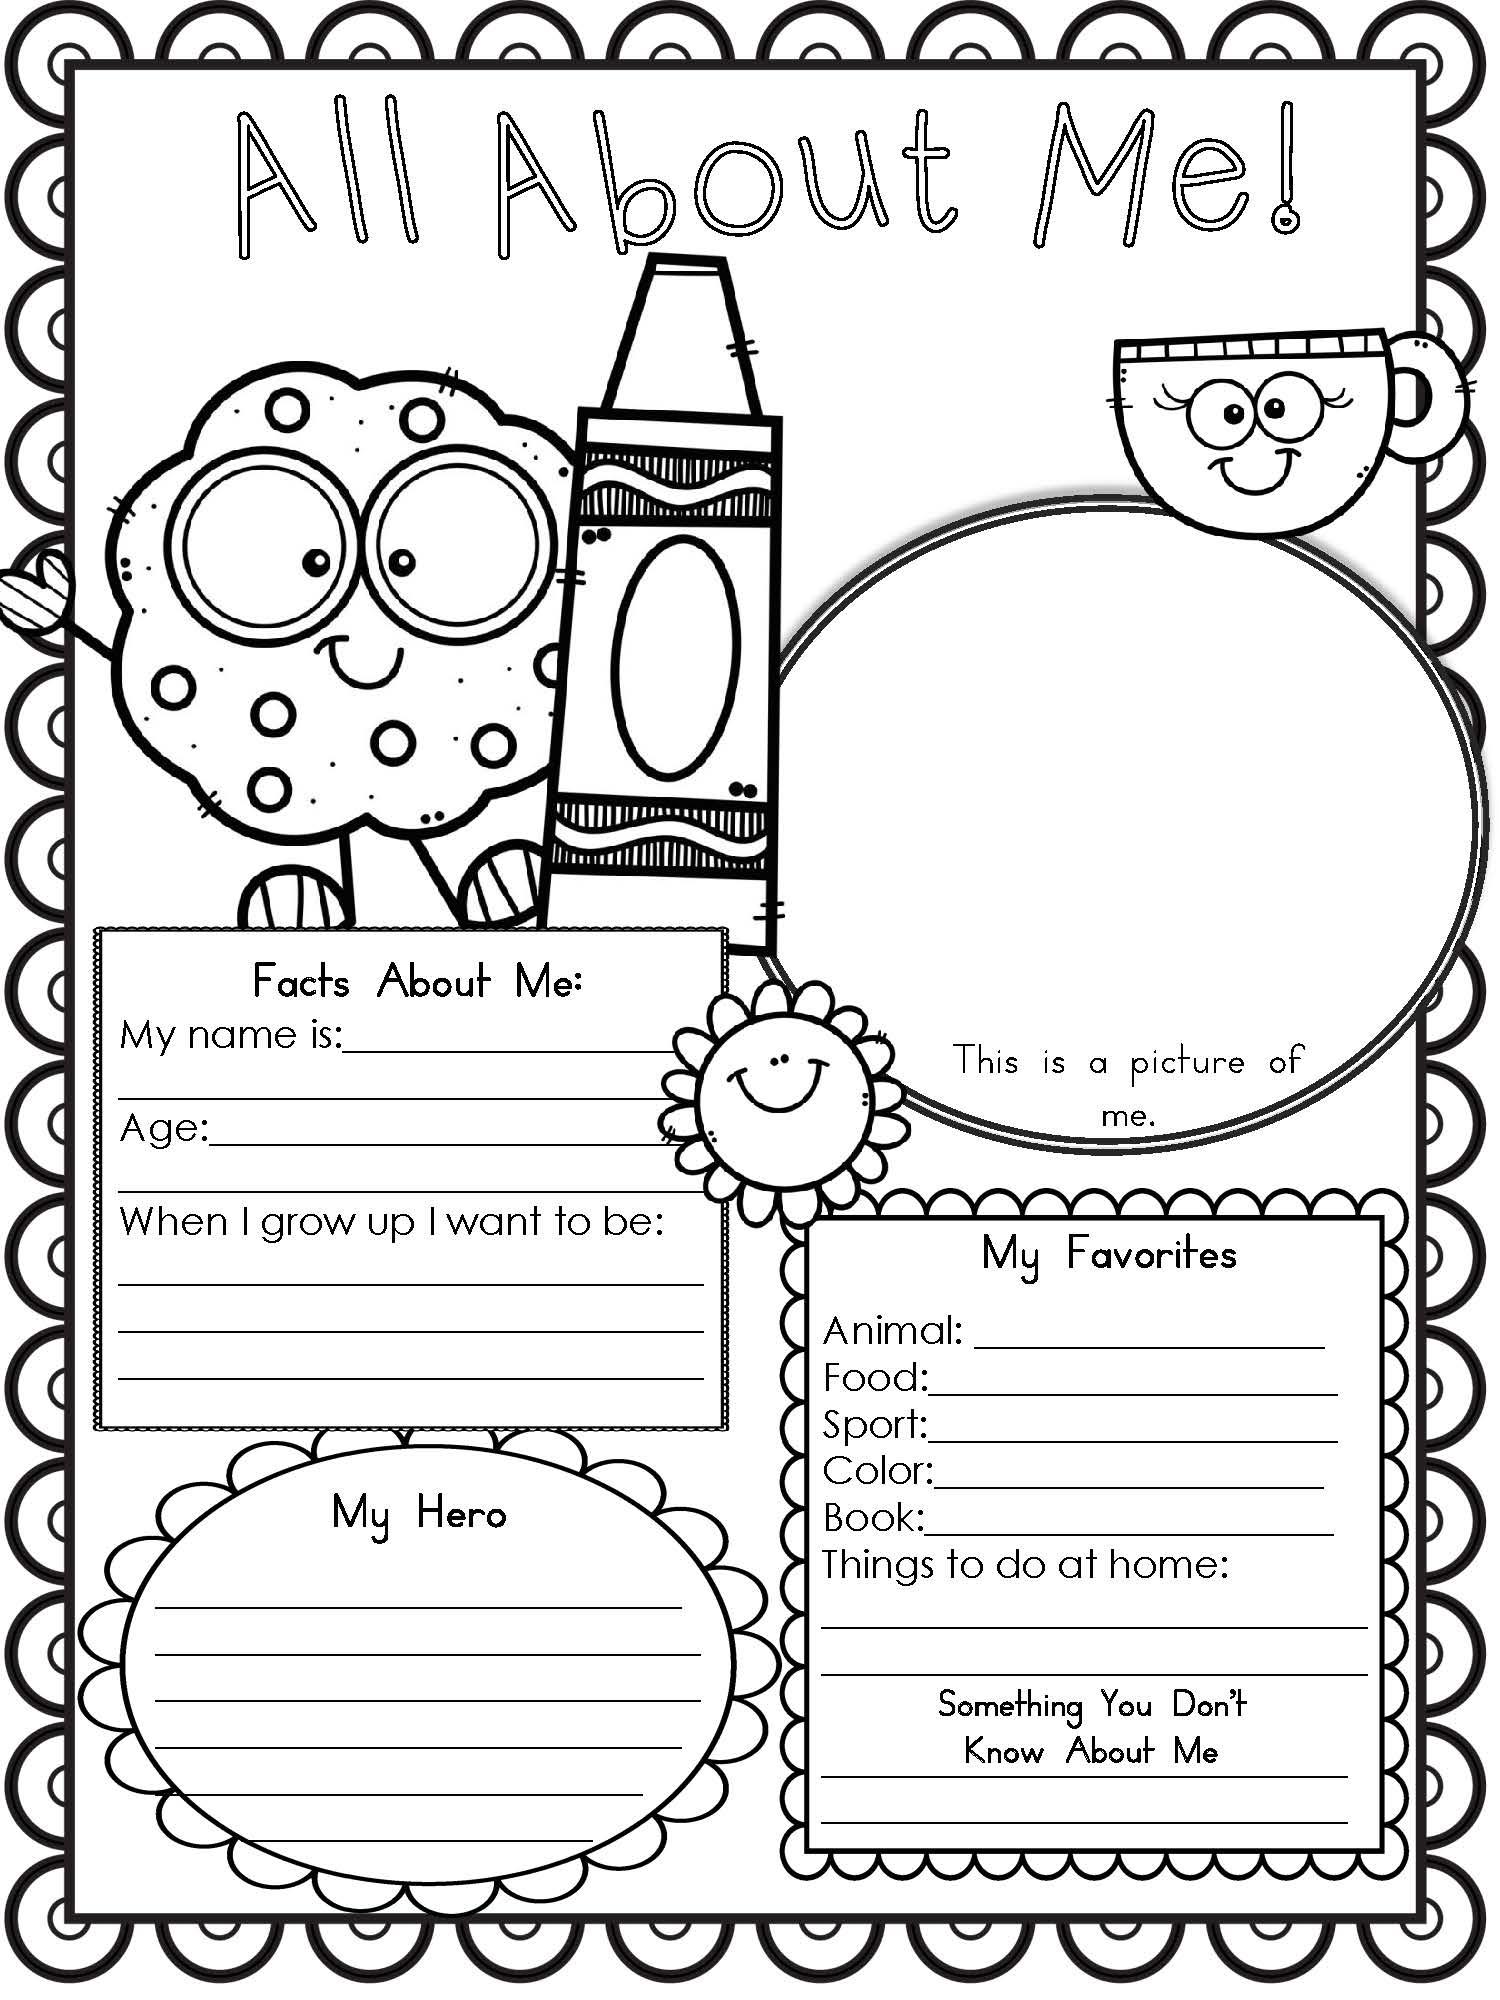 All About Me Worksheet Preschool